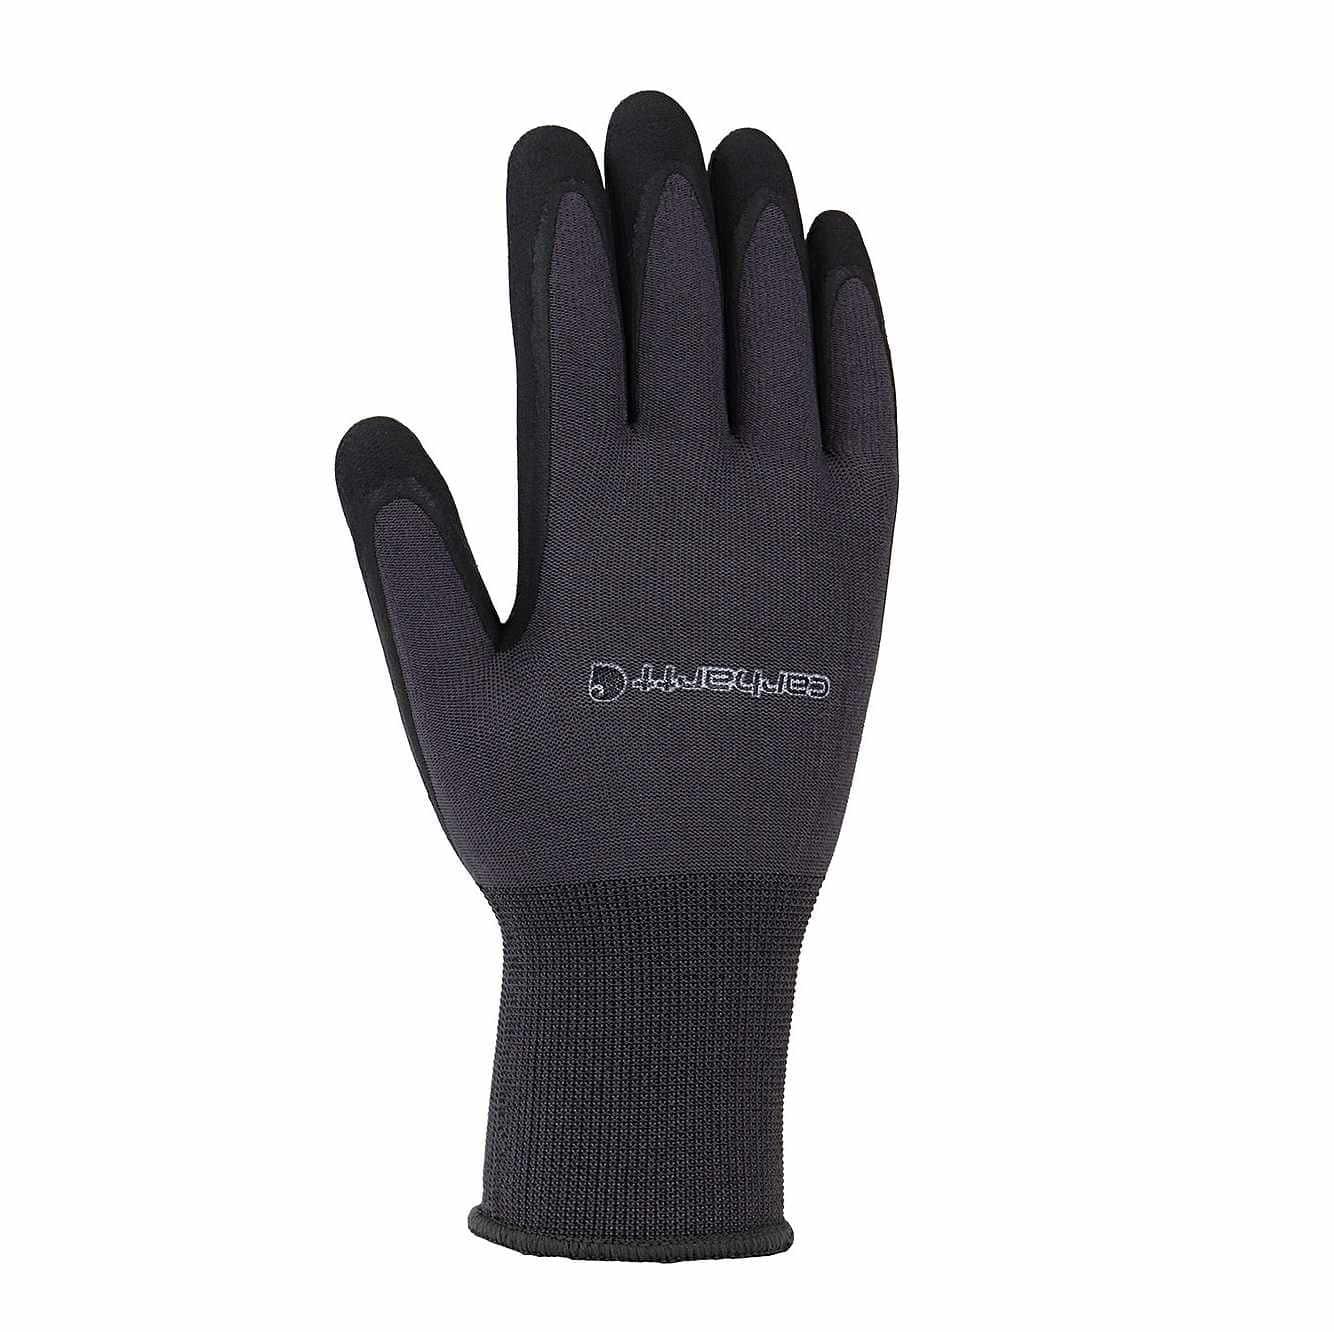 Picture of All-Purpose Nitrile Grip Glove in Gunmetal